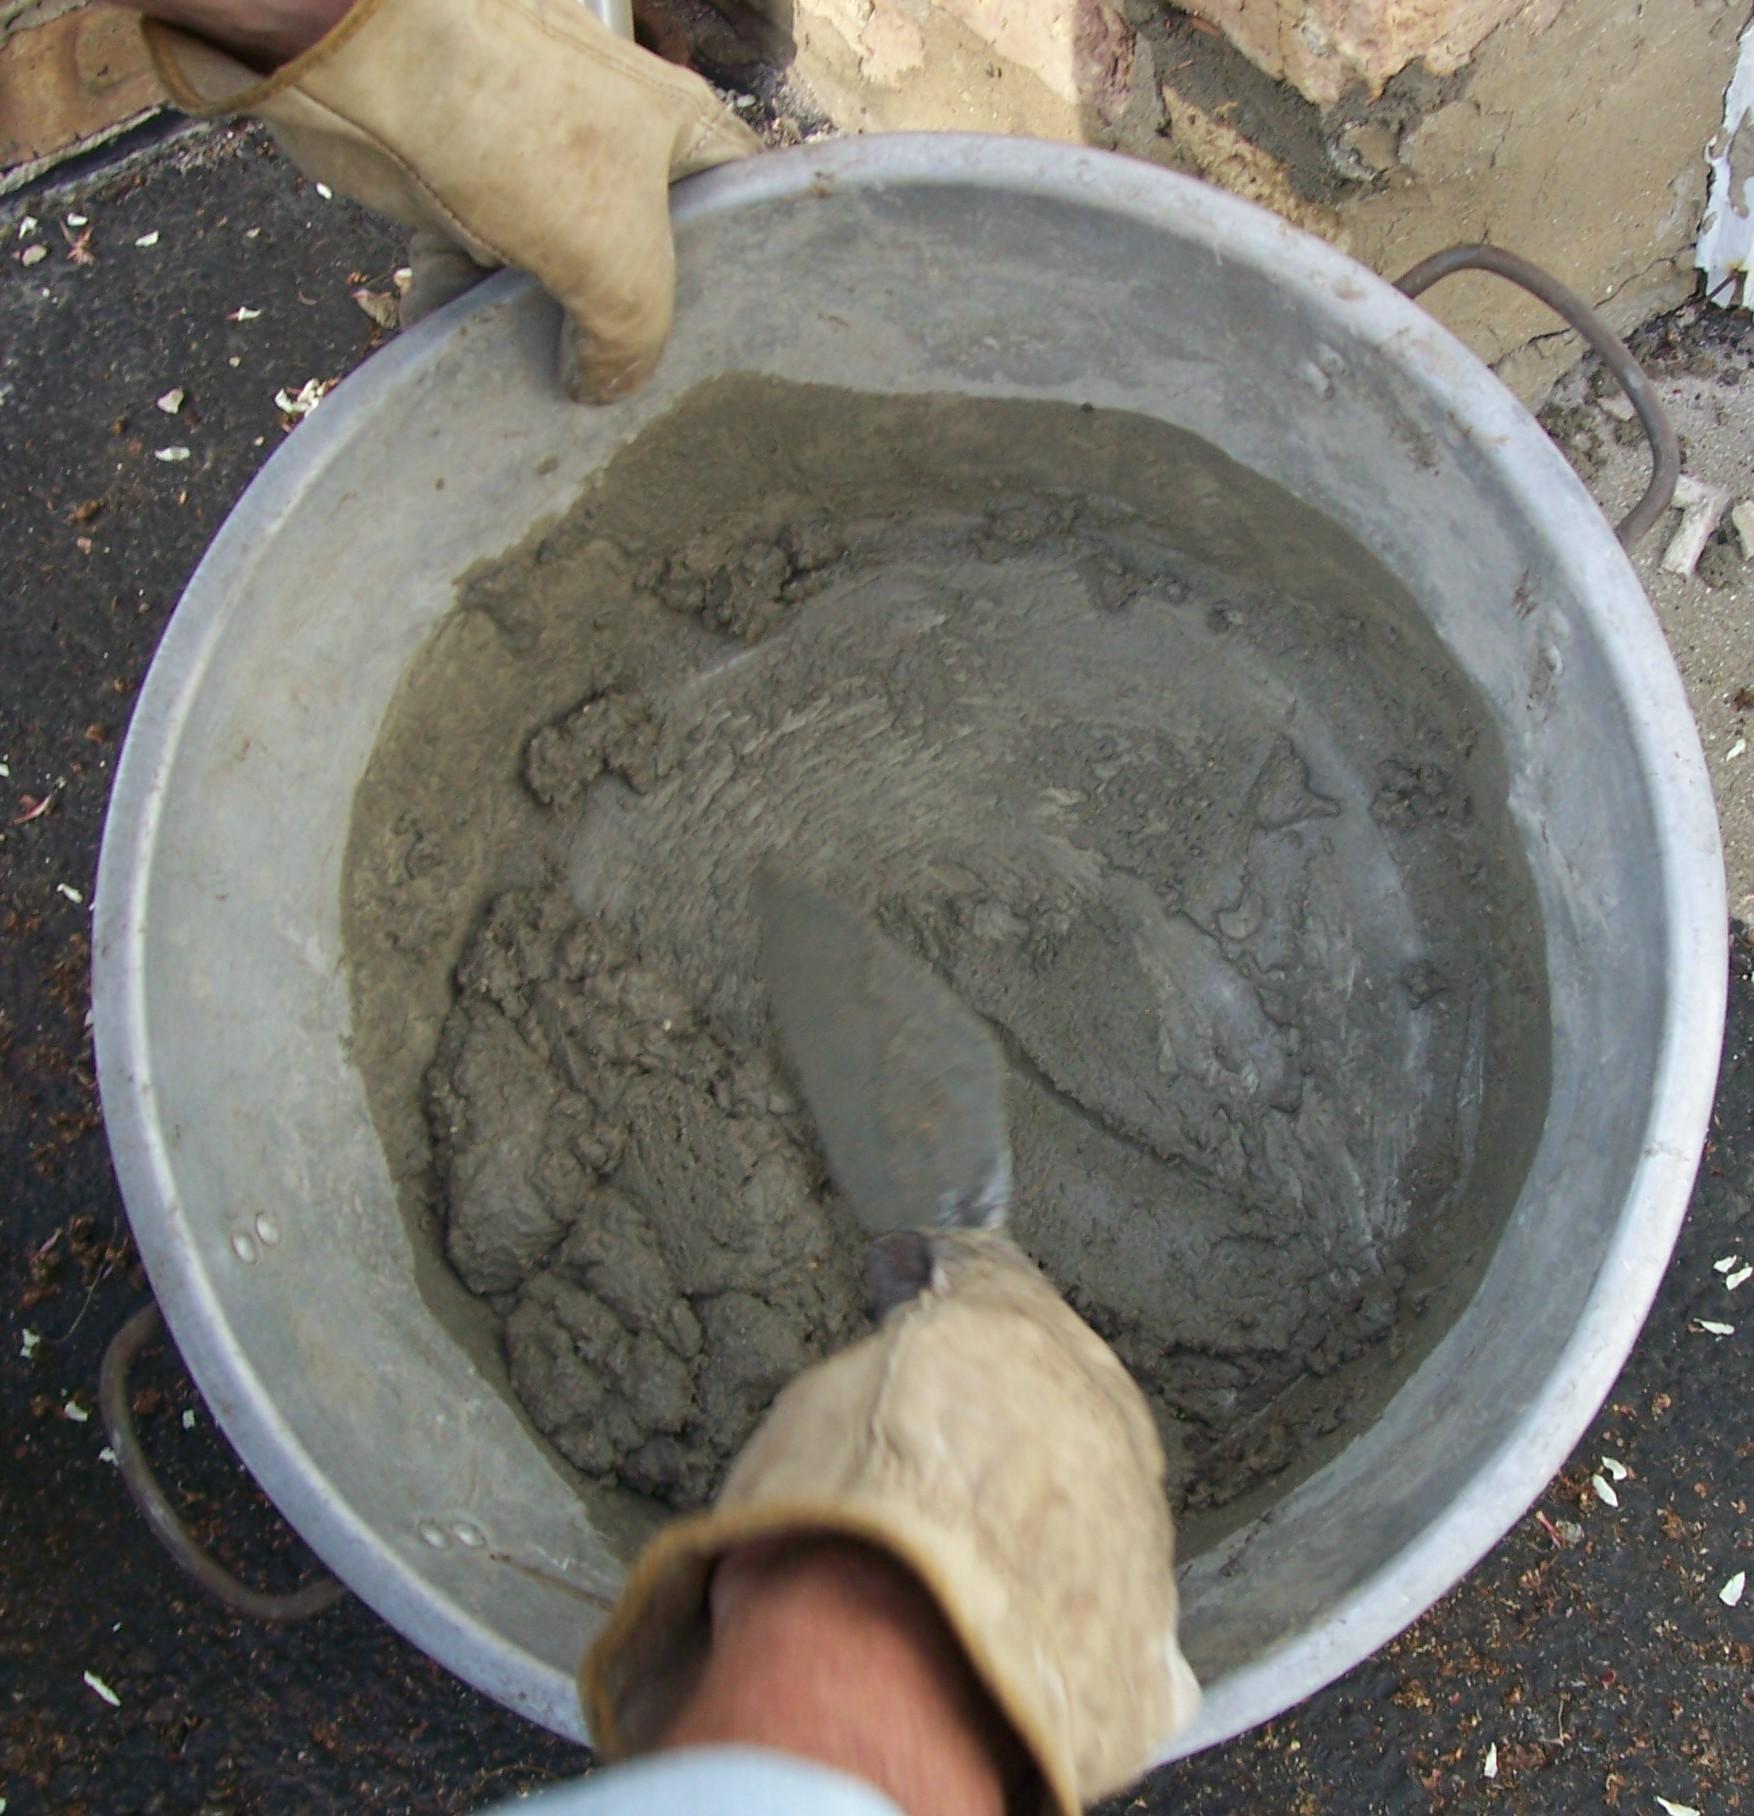 Masonry Mortar Pan : How to repair mortar joints pro construction guide